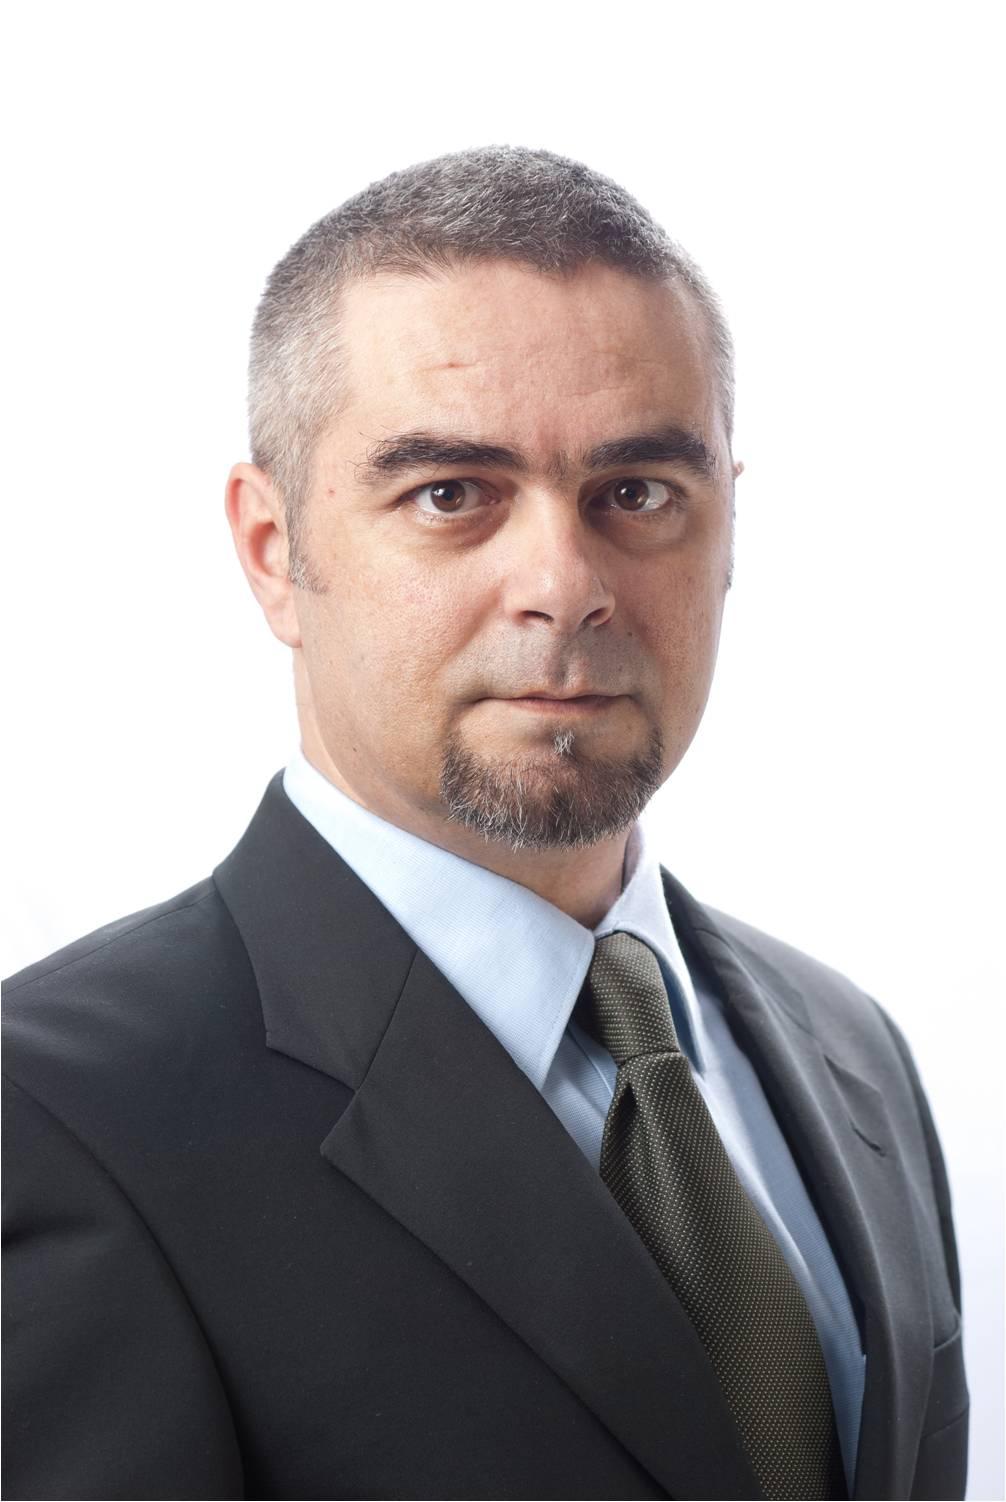 SERBAN Mrejeriu